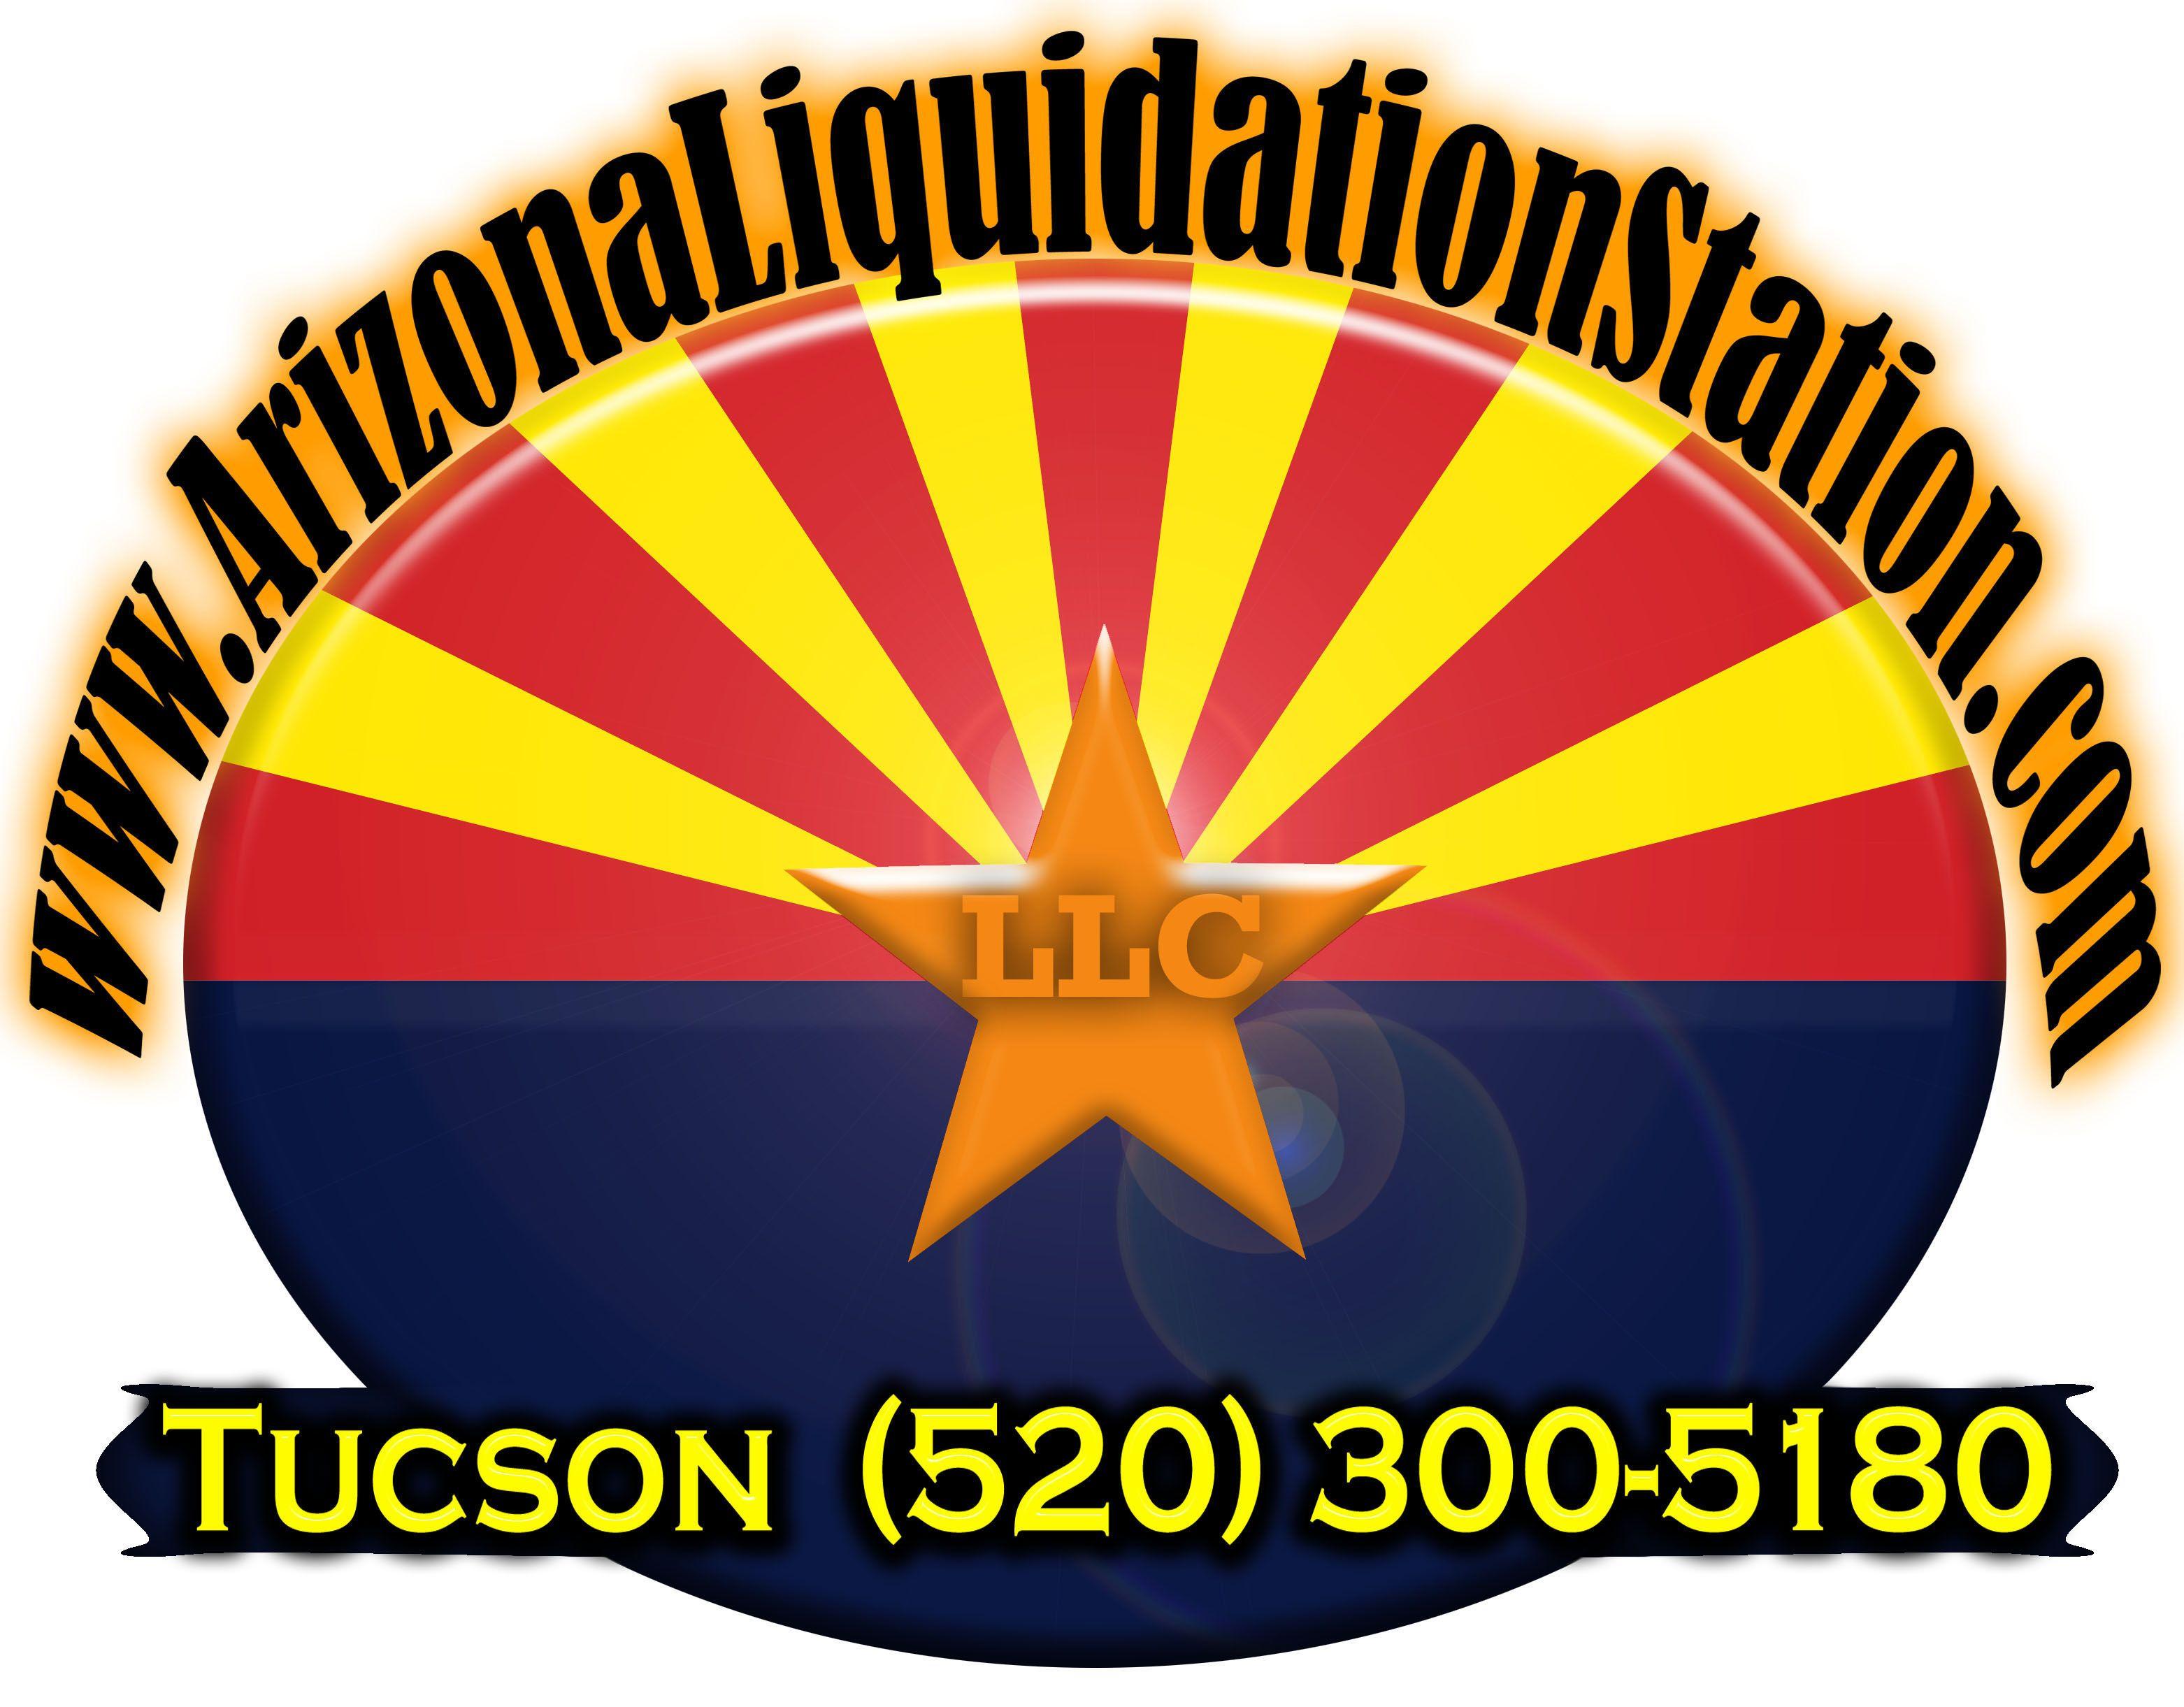 Tucson Arizona Auction, Appraise and Liquidation